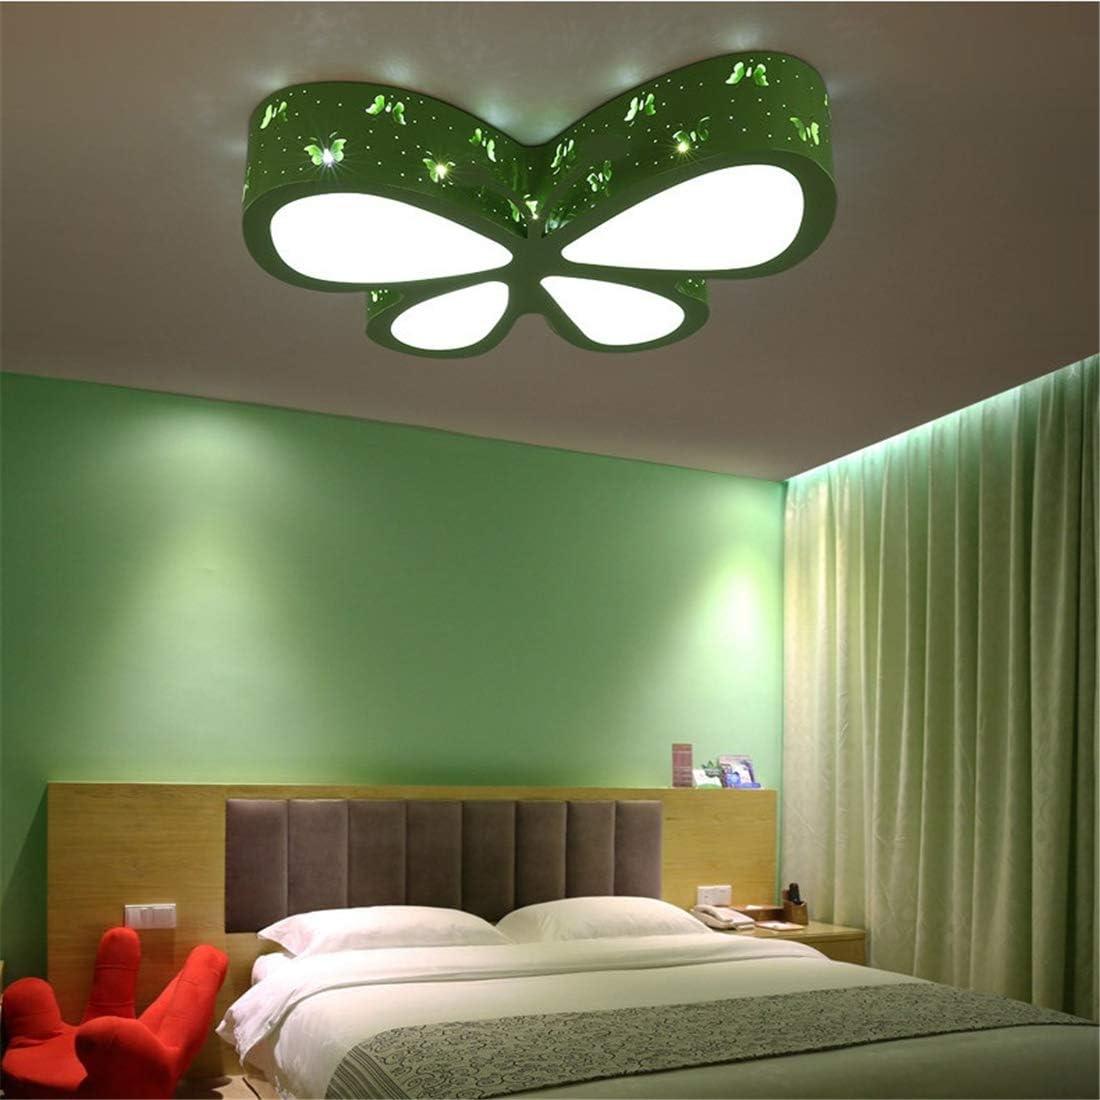 LHY LOFT Mariposa LED Infantil Plaf/ón,Infantil L/ámpara De Techo,Infantil Habitaci/ón Plaf/ón LED,Tallado Hueco Dise/ño Lado Glow L/ámparas Decorativas,Verde,A:50CM32W